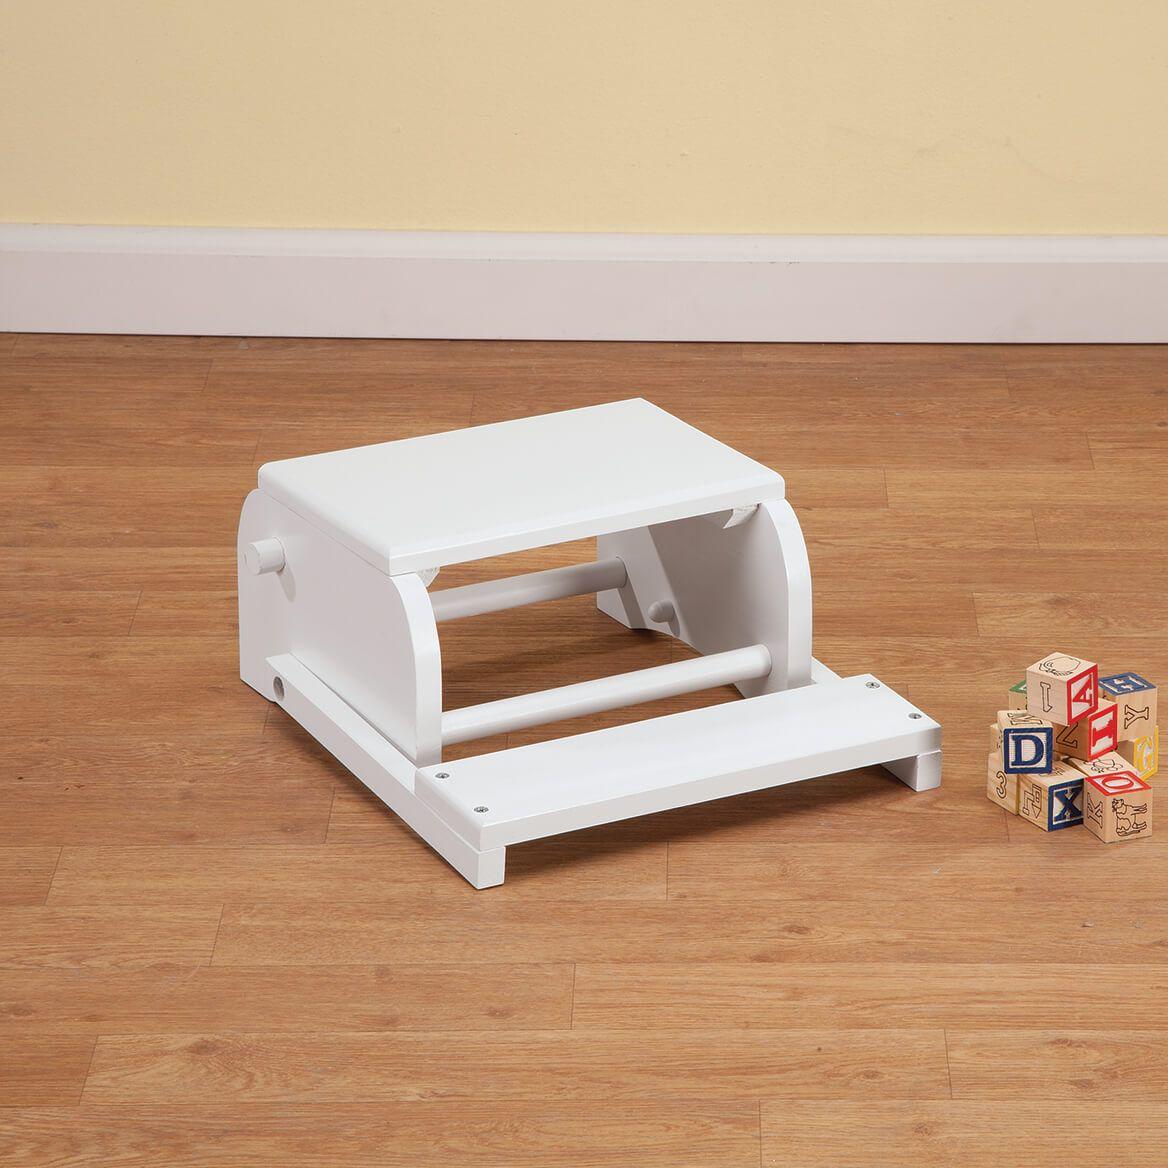 Personalized Children's White Dinosaur Step Stool-368496